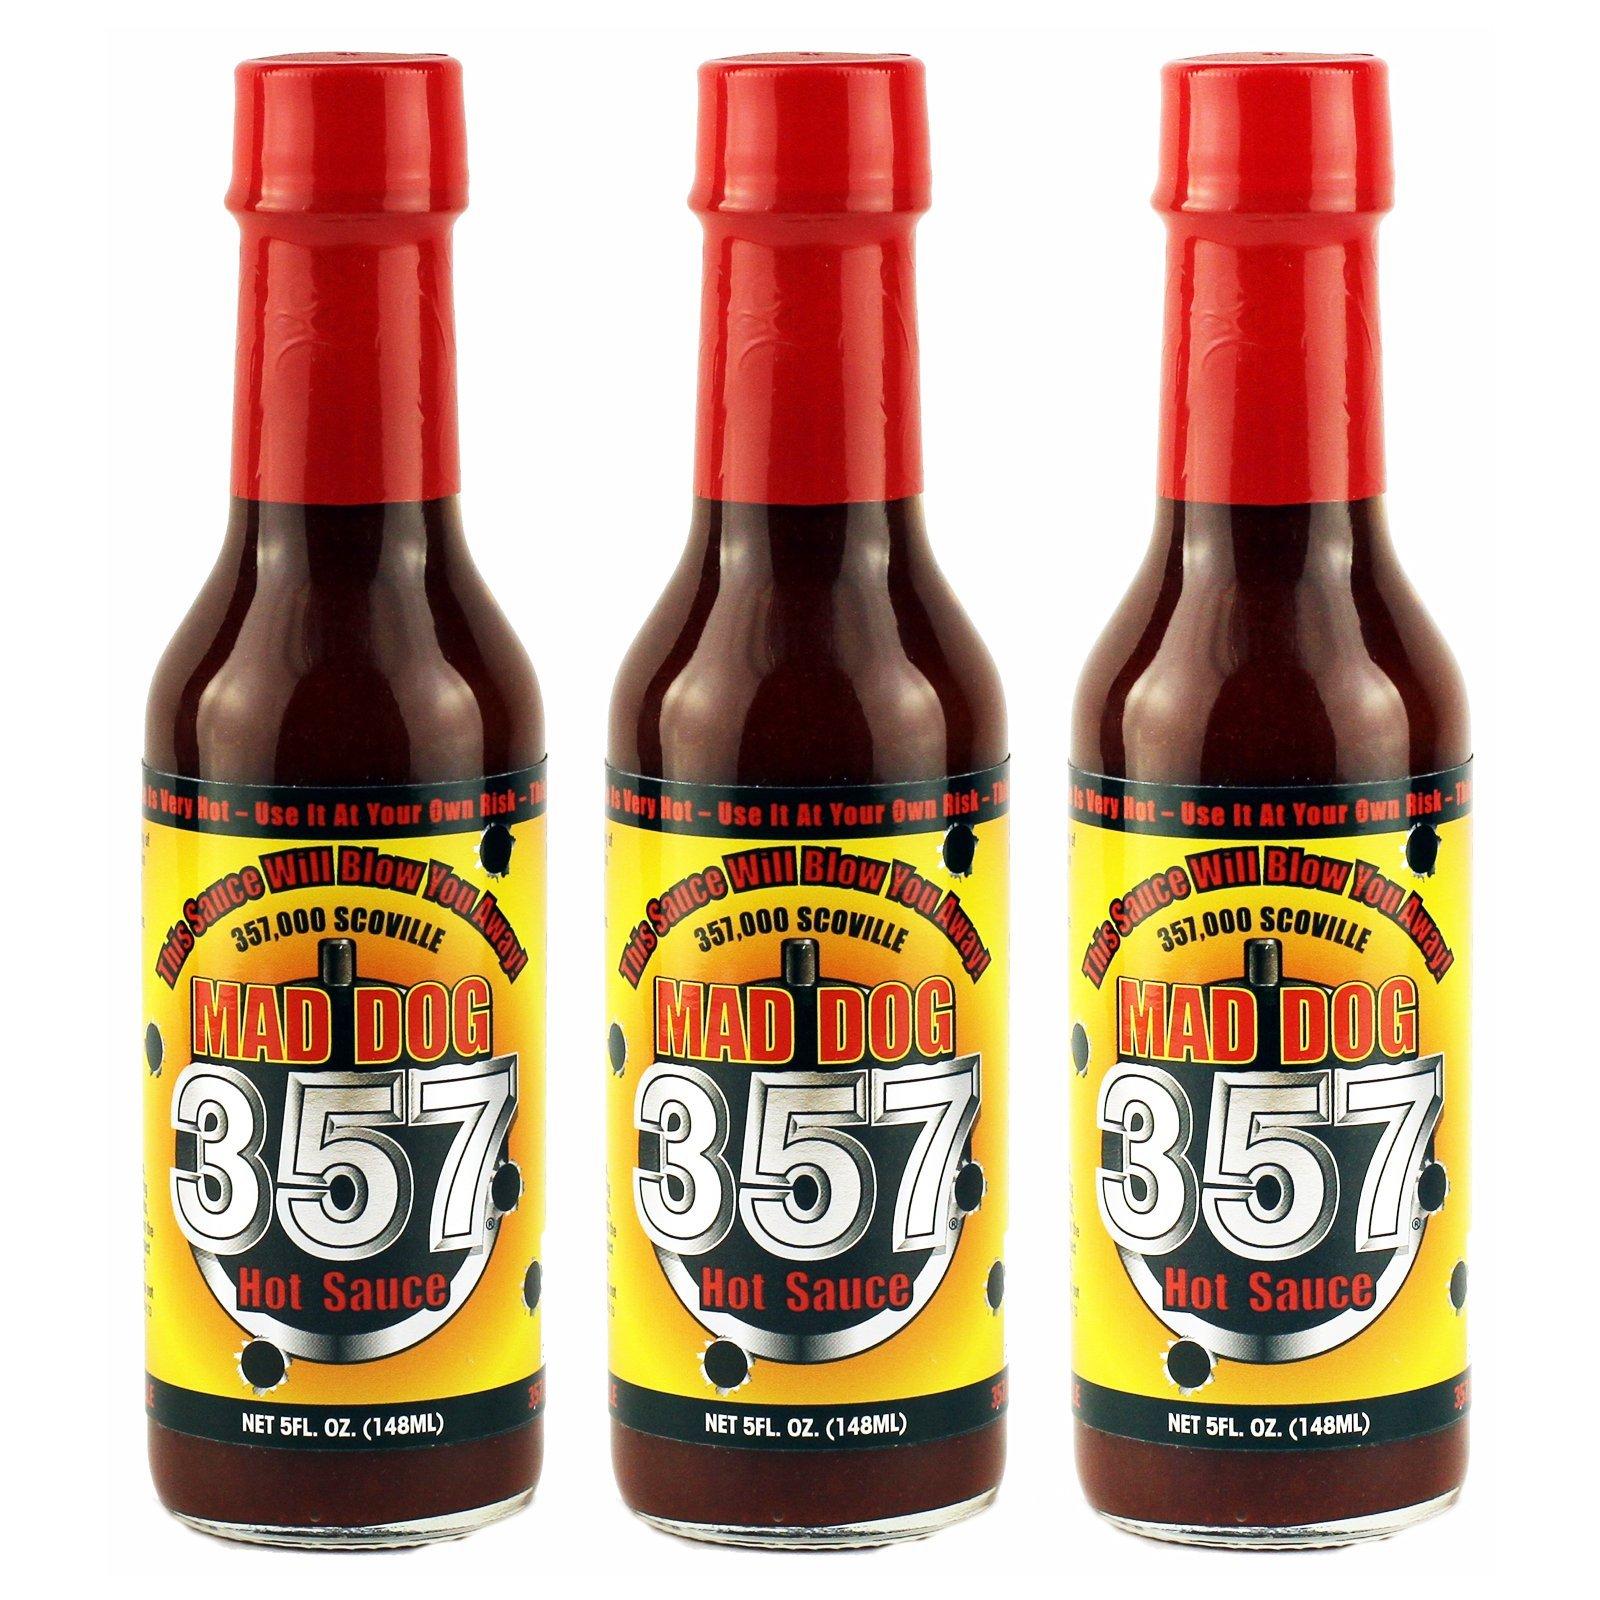 Mad Dog 357 Hot Sauce 5oz, 3 pack